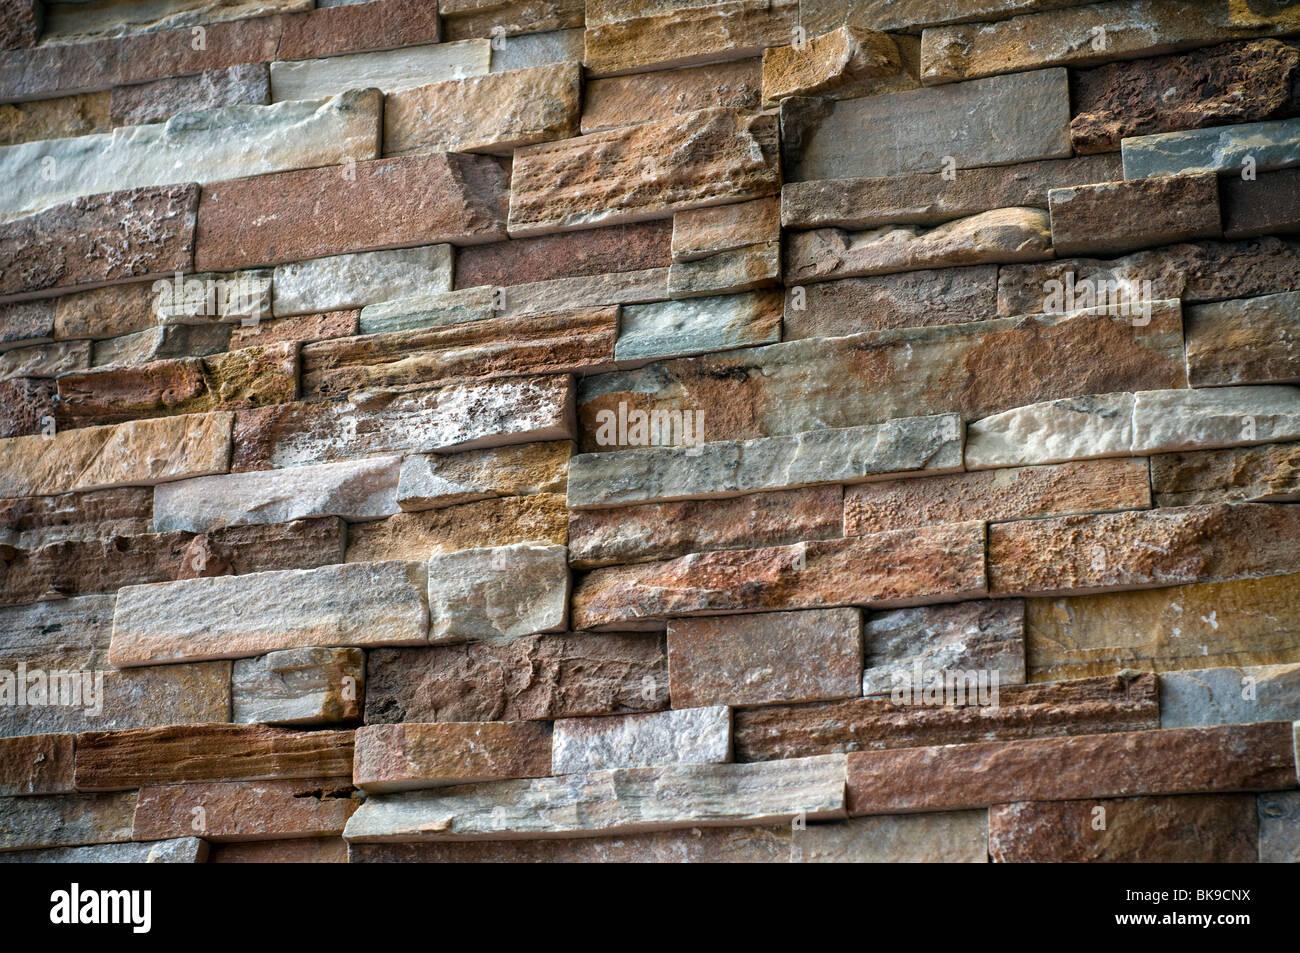 Interior Dry Stone Wall,3D Cladding,Devon Stone   Stock Image